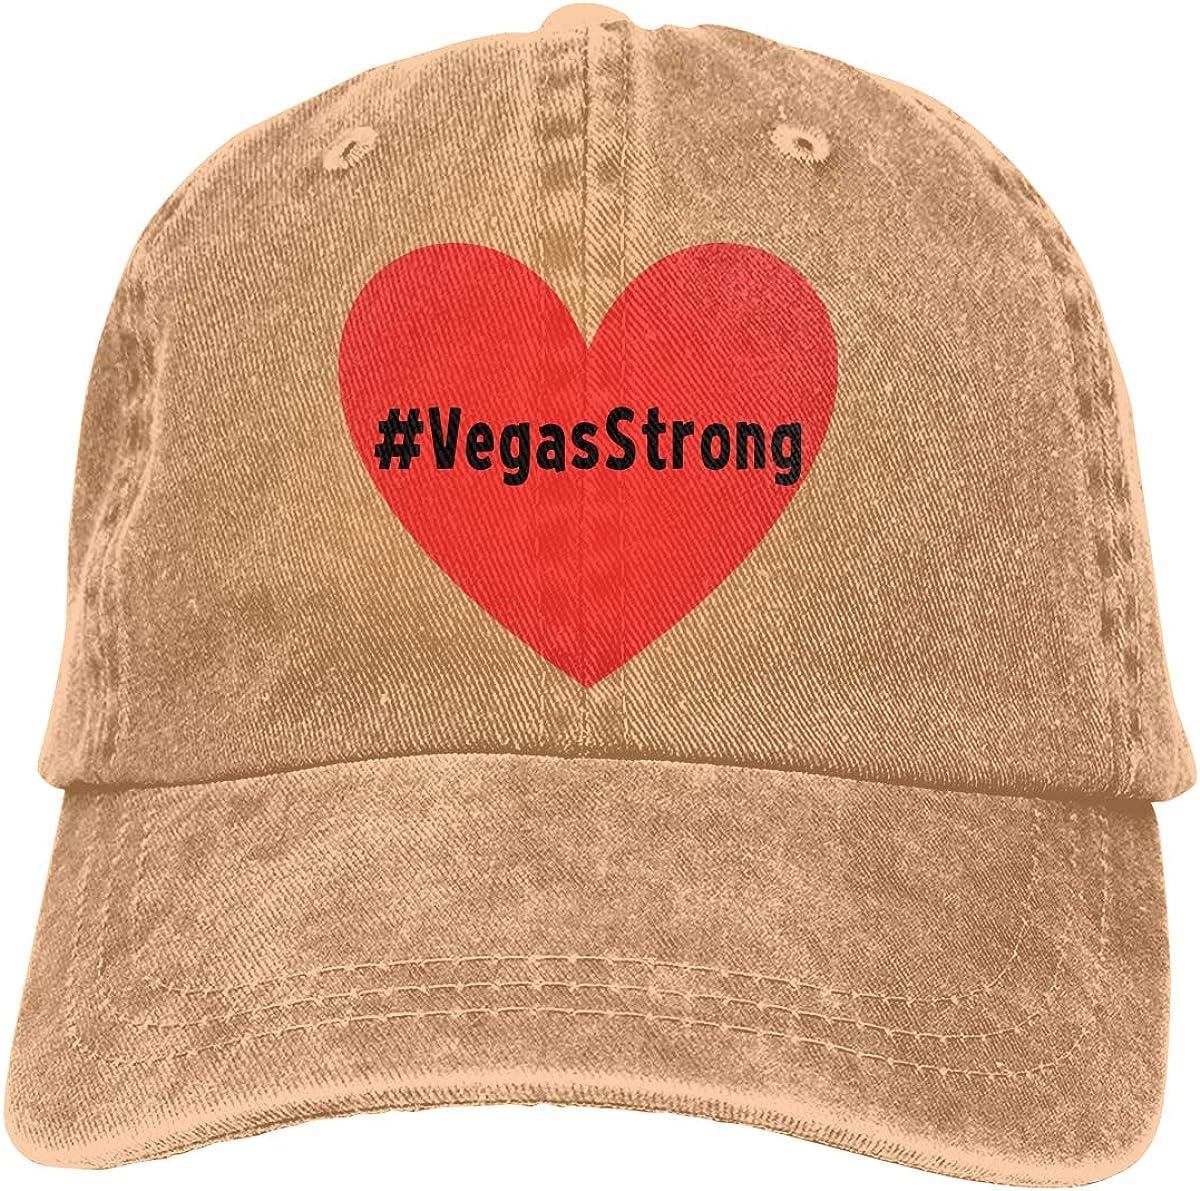 Vegas Strong Decal Unisex Adult Cowboy Hat Sun Hat Adjustable Baseball Cap